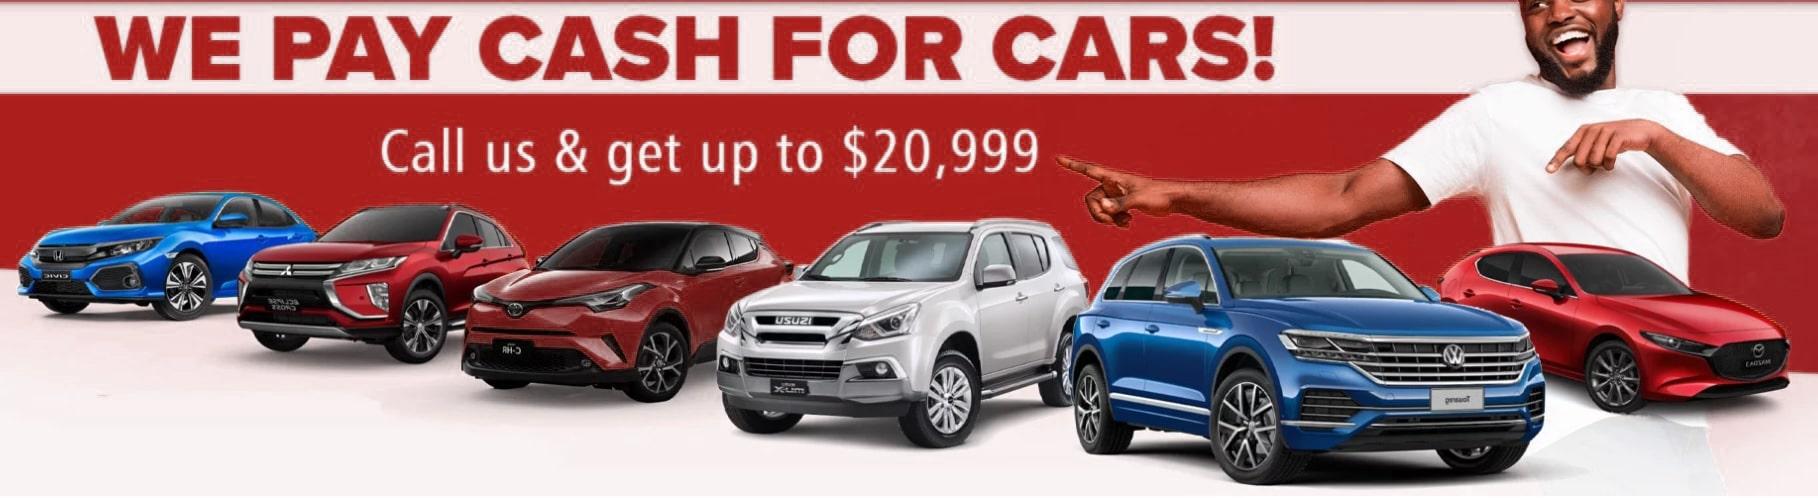 Cash for Cars Frankston South